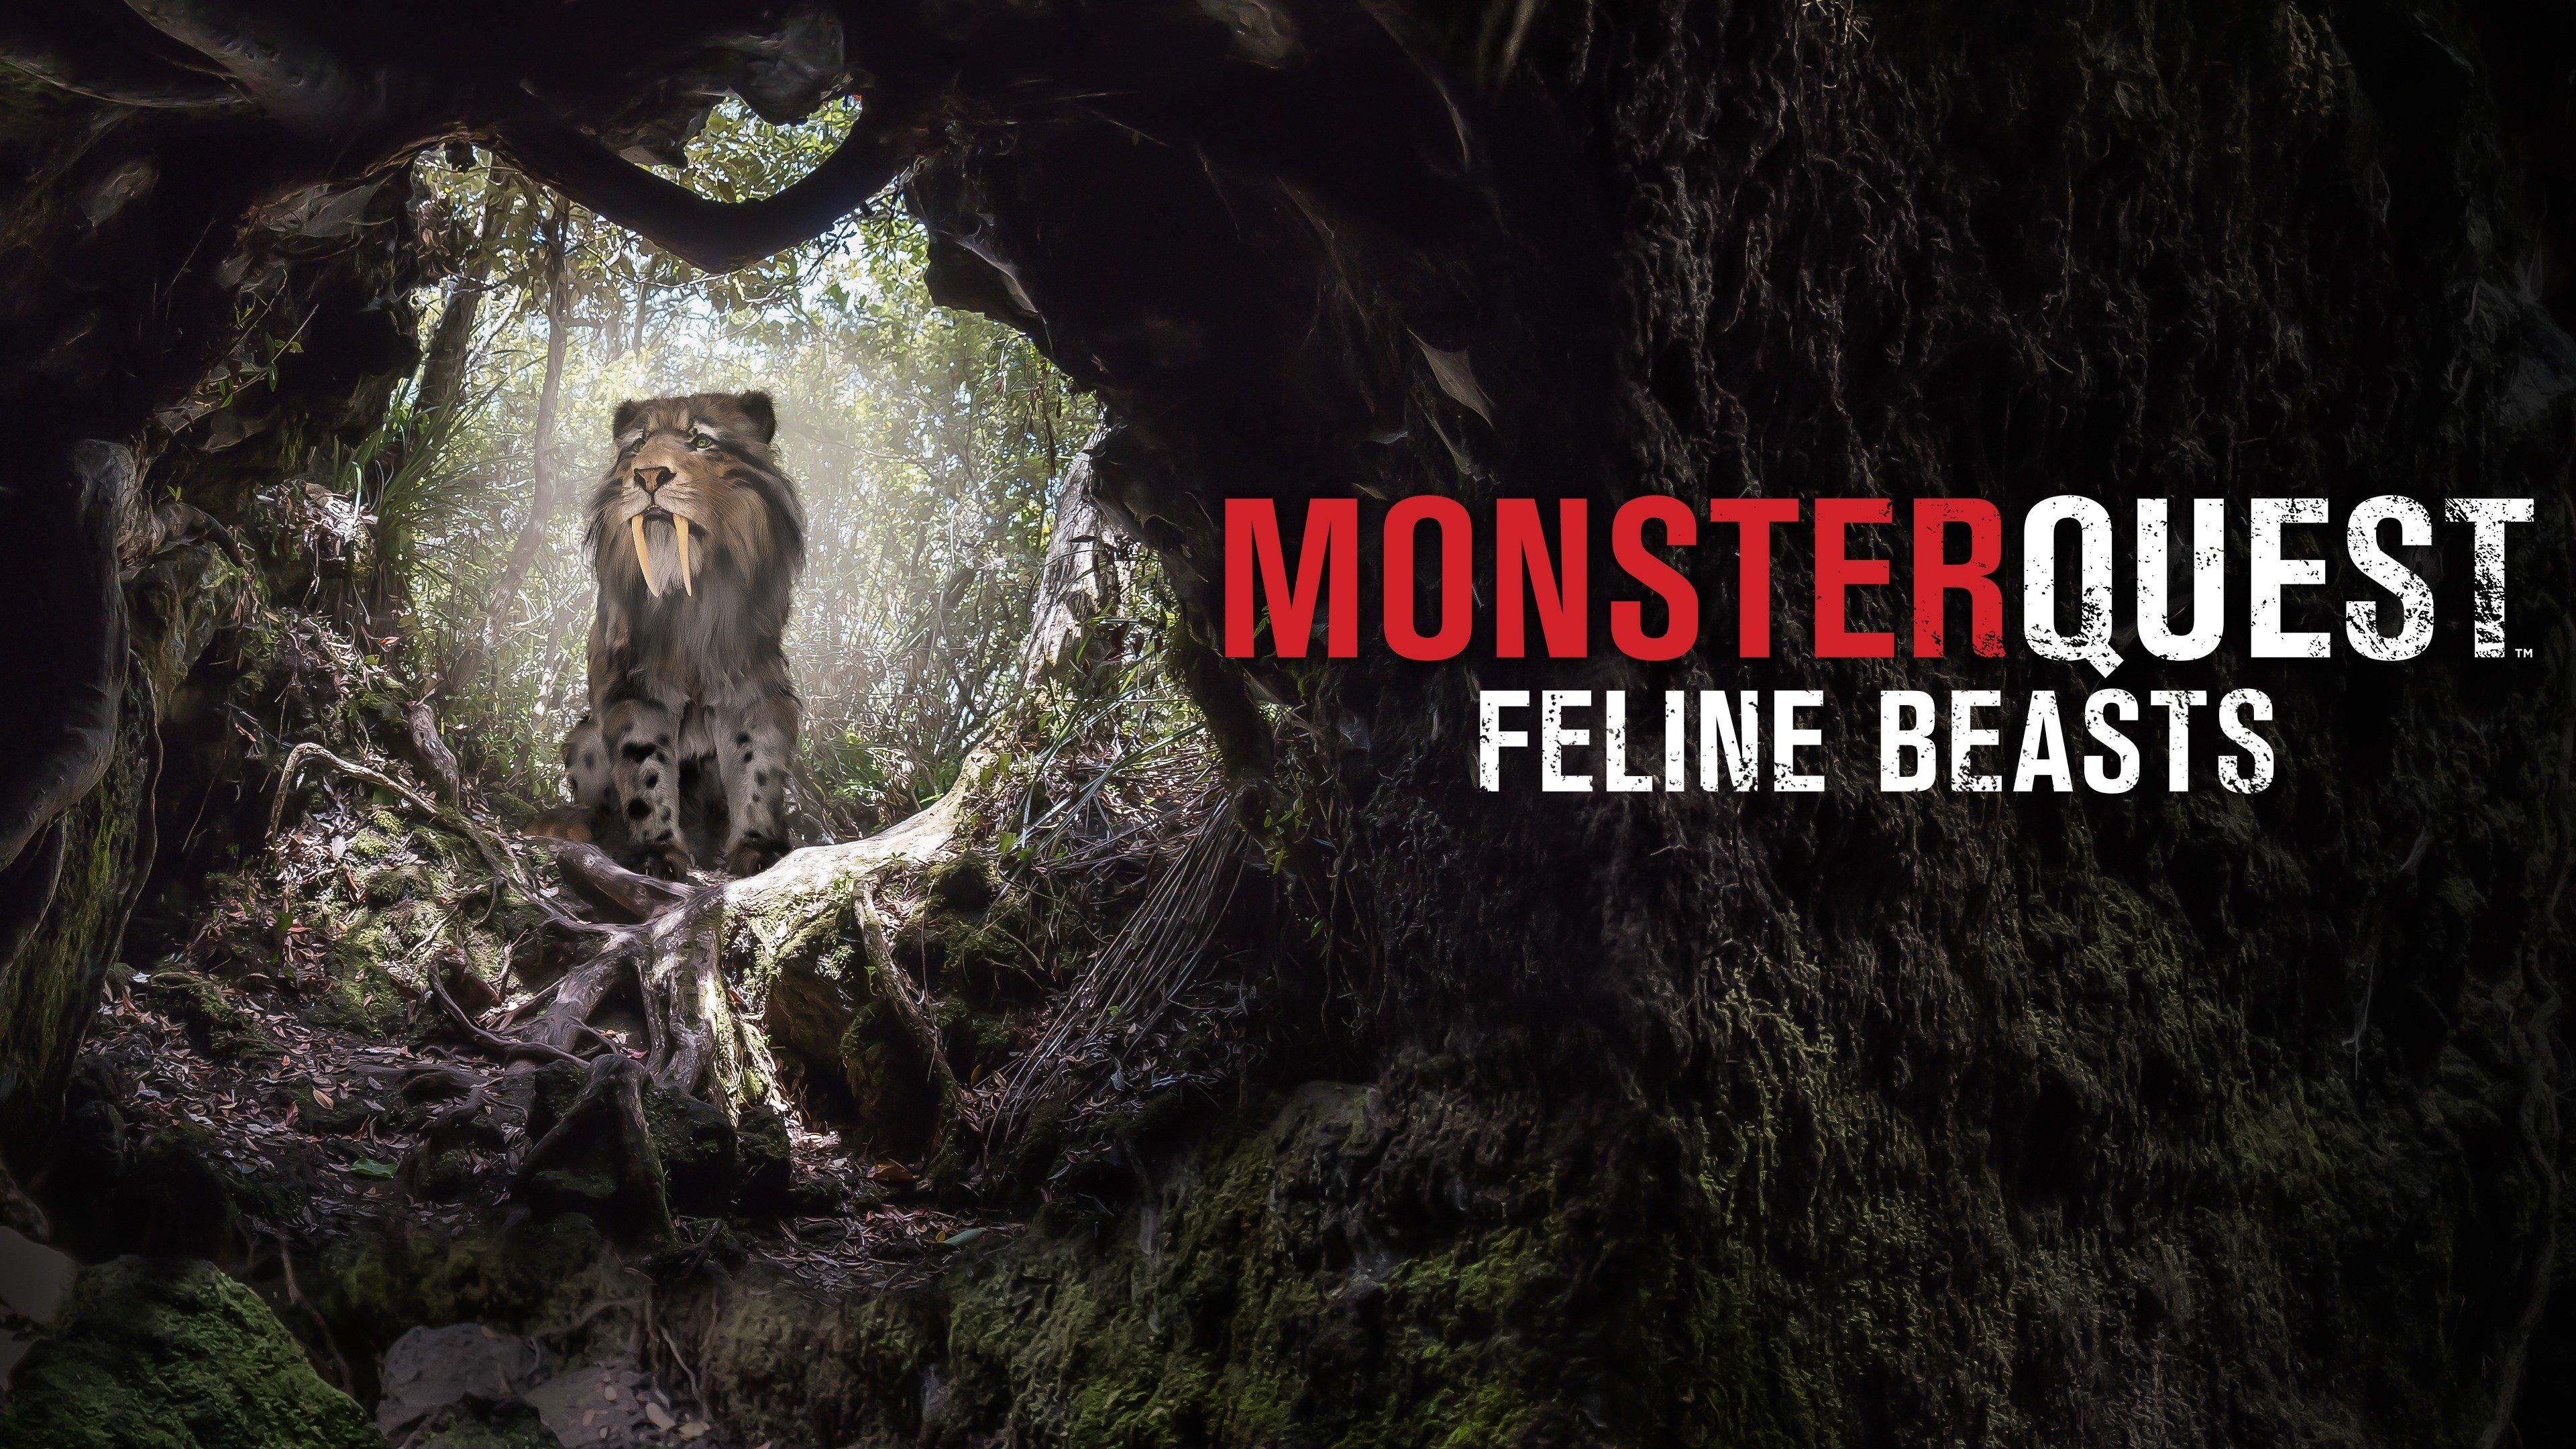 MonsterQuest: Feline Beasts